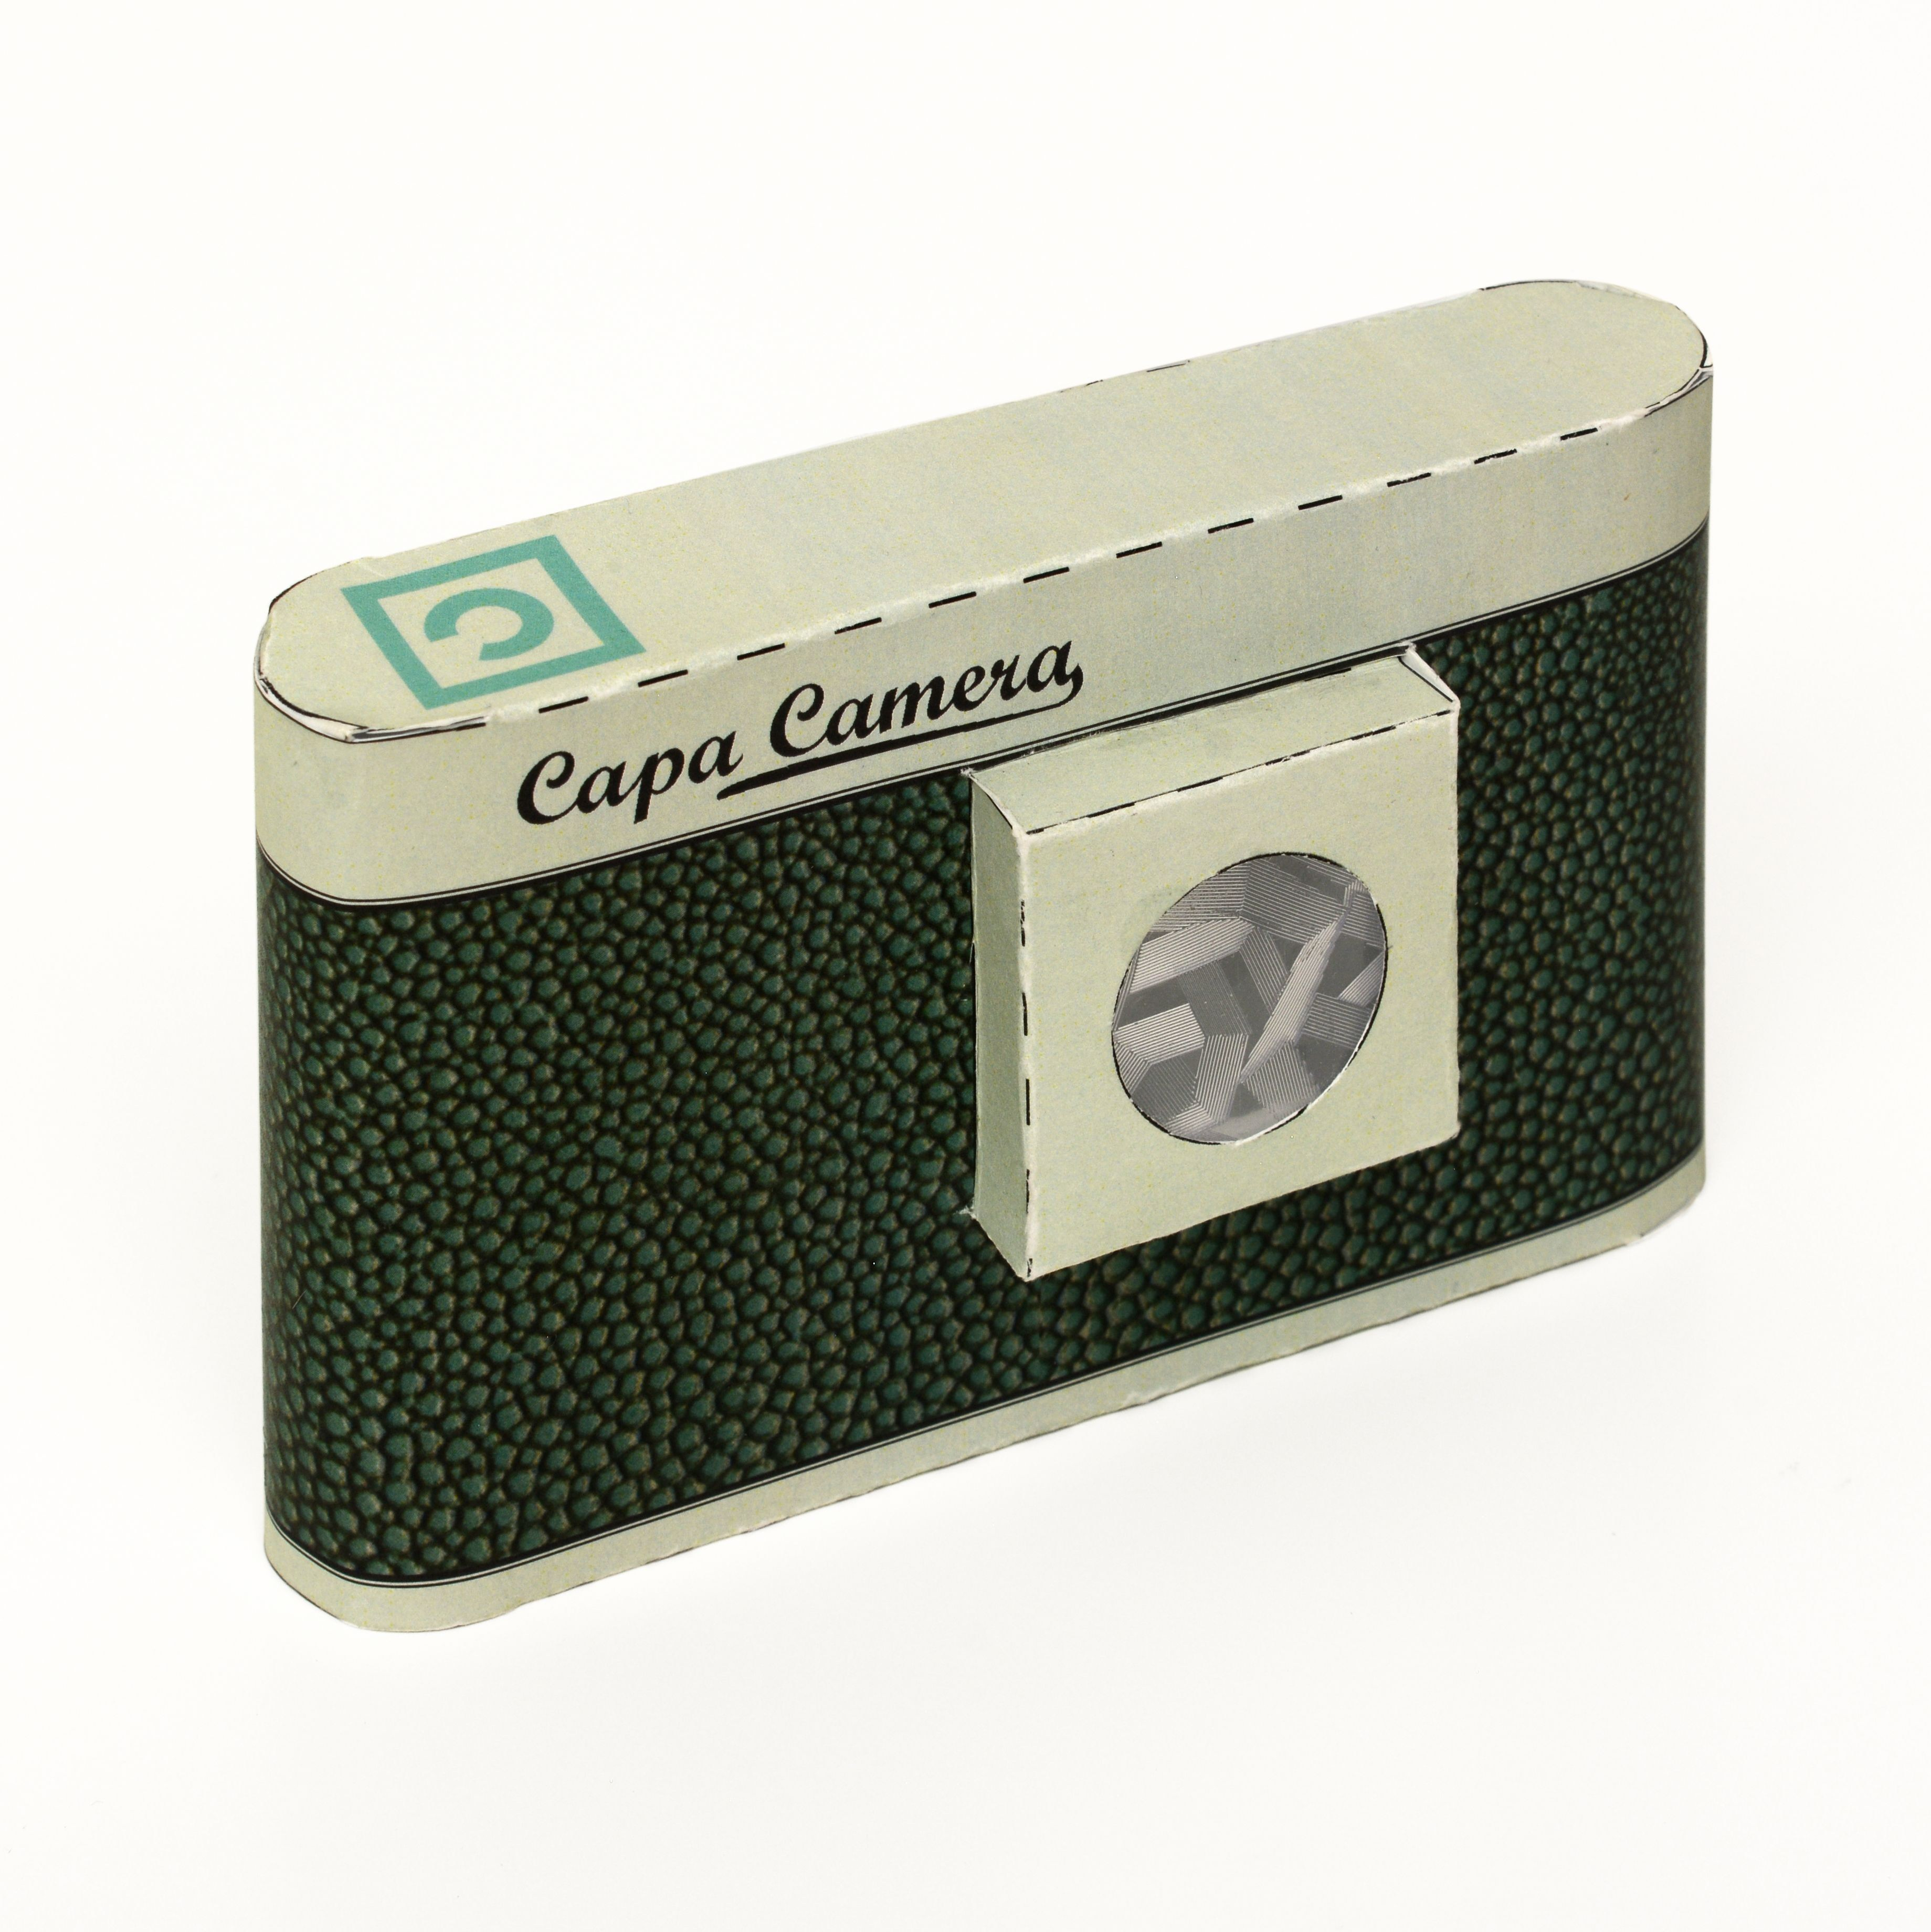 Capa kamera 750.- HUF